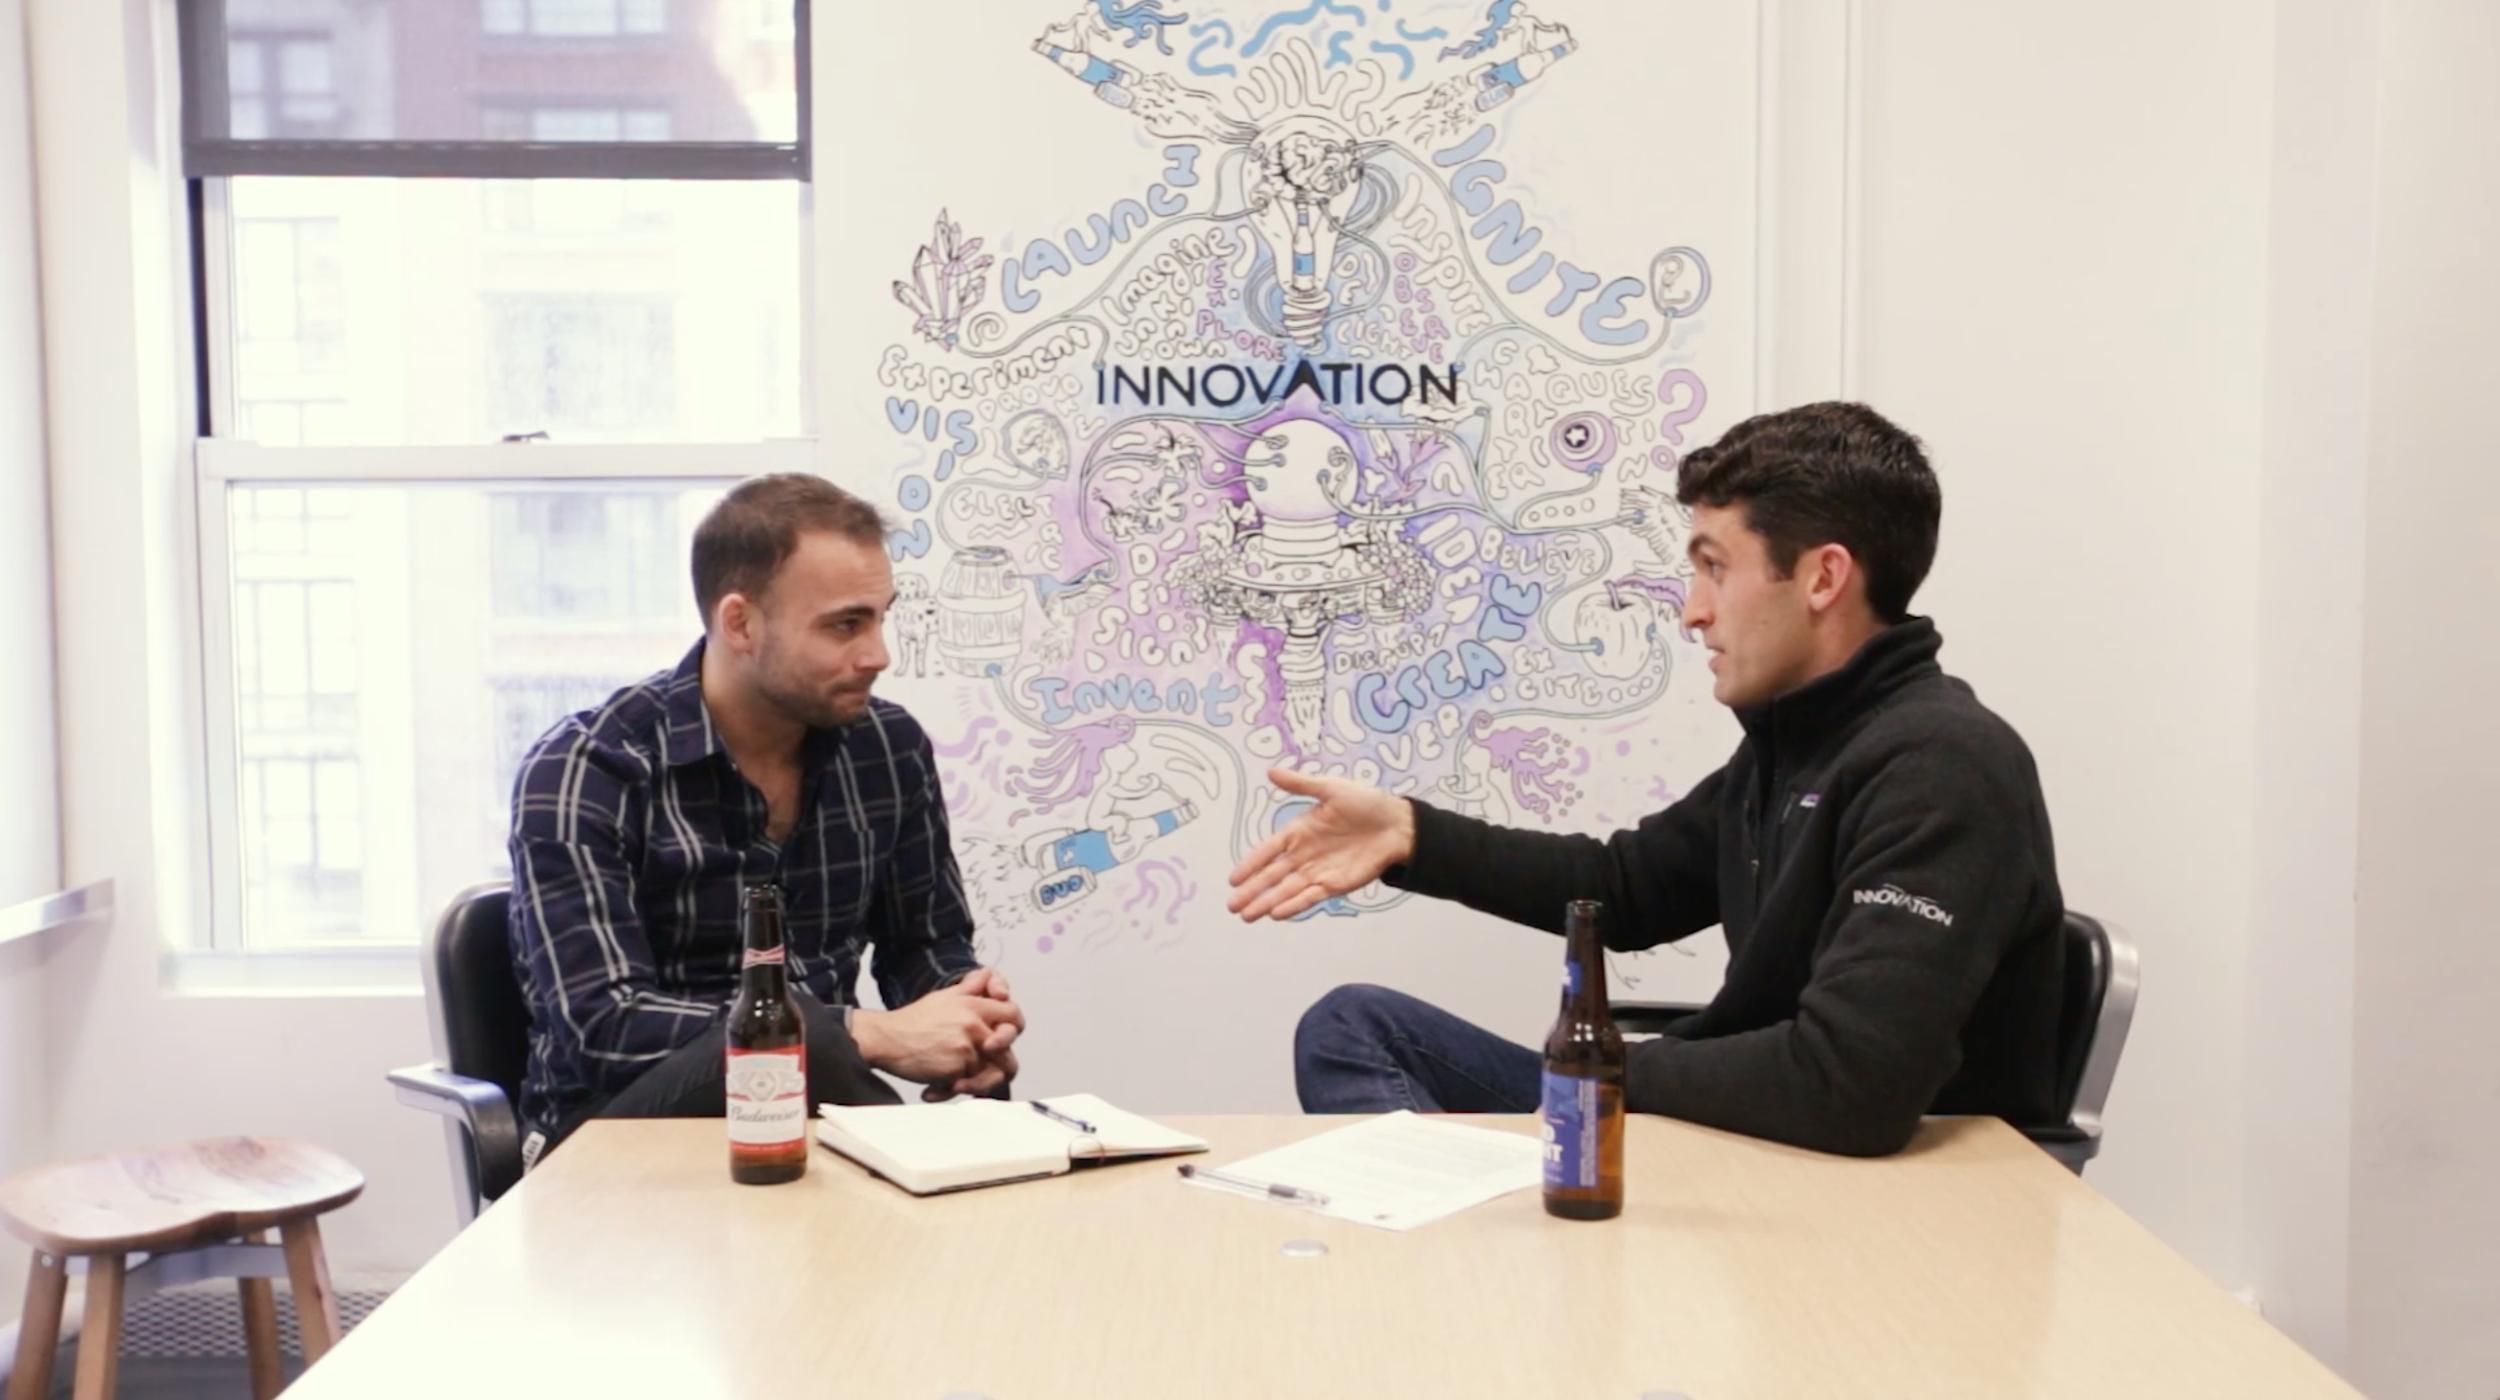 Episode 1: Derek Mauk, Anheuser-Busch InBev - How a Culture of Ownership Accelerates Innovation